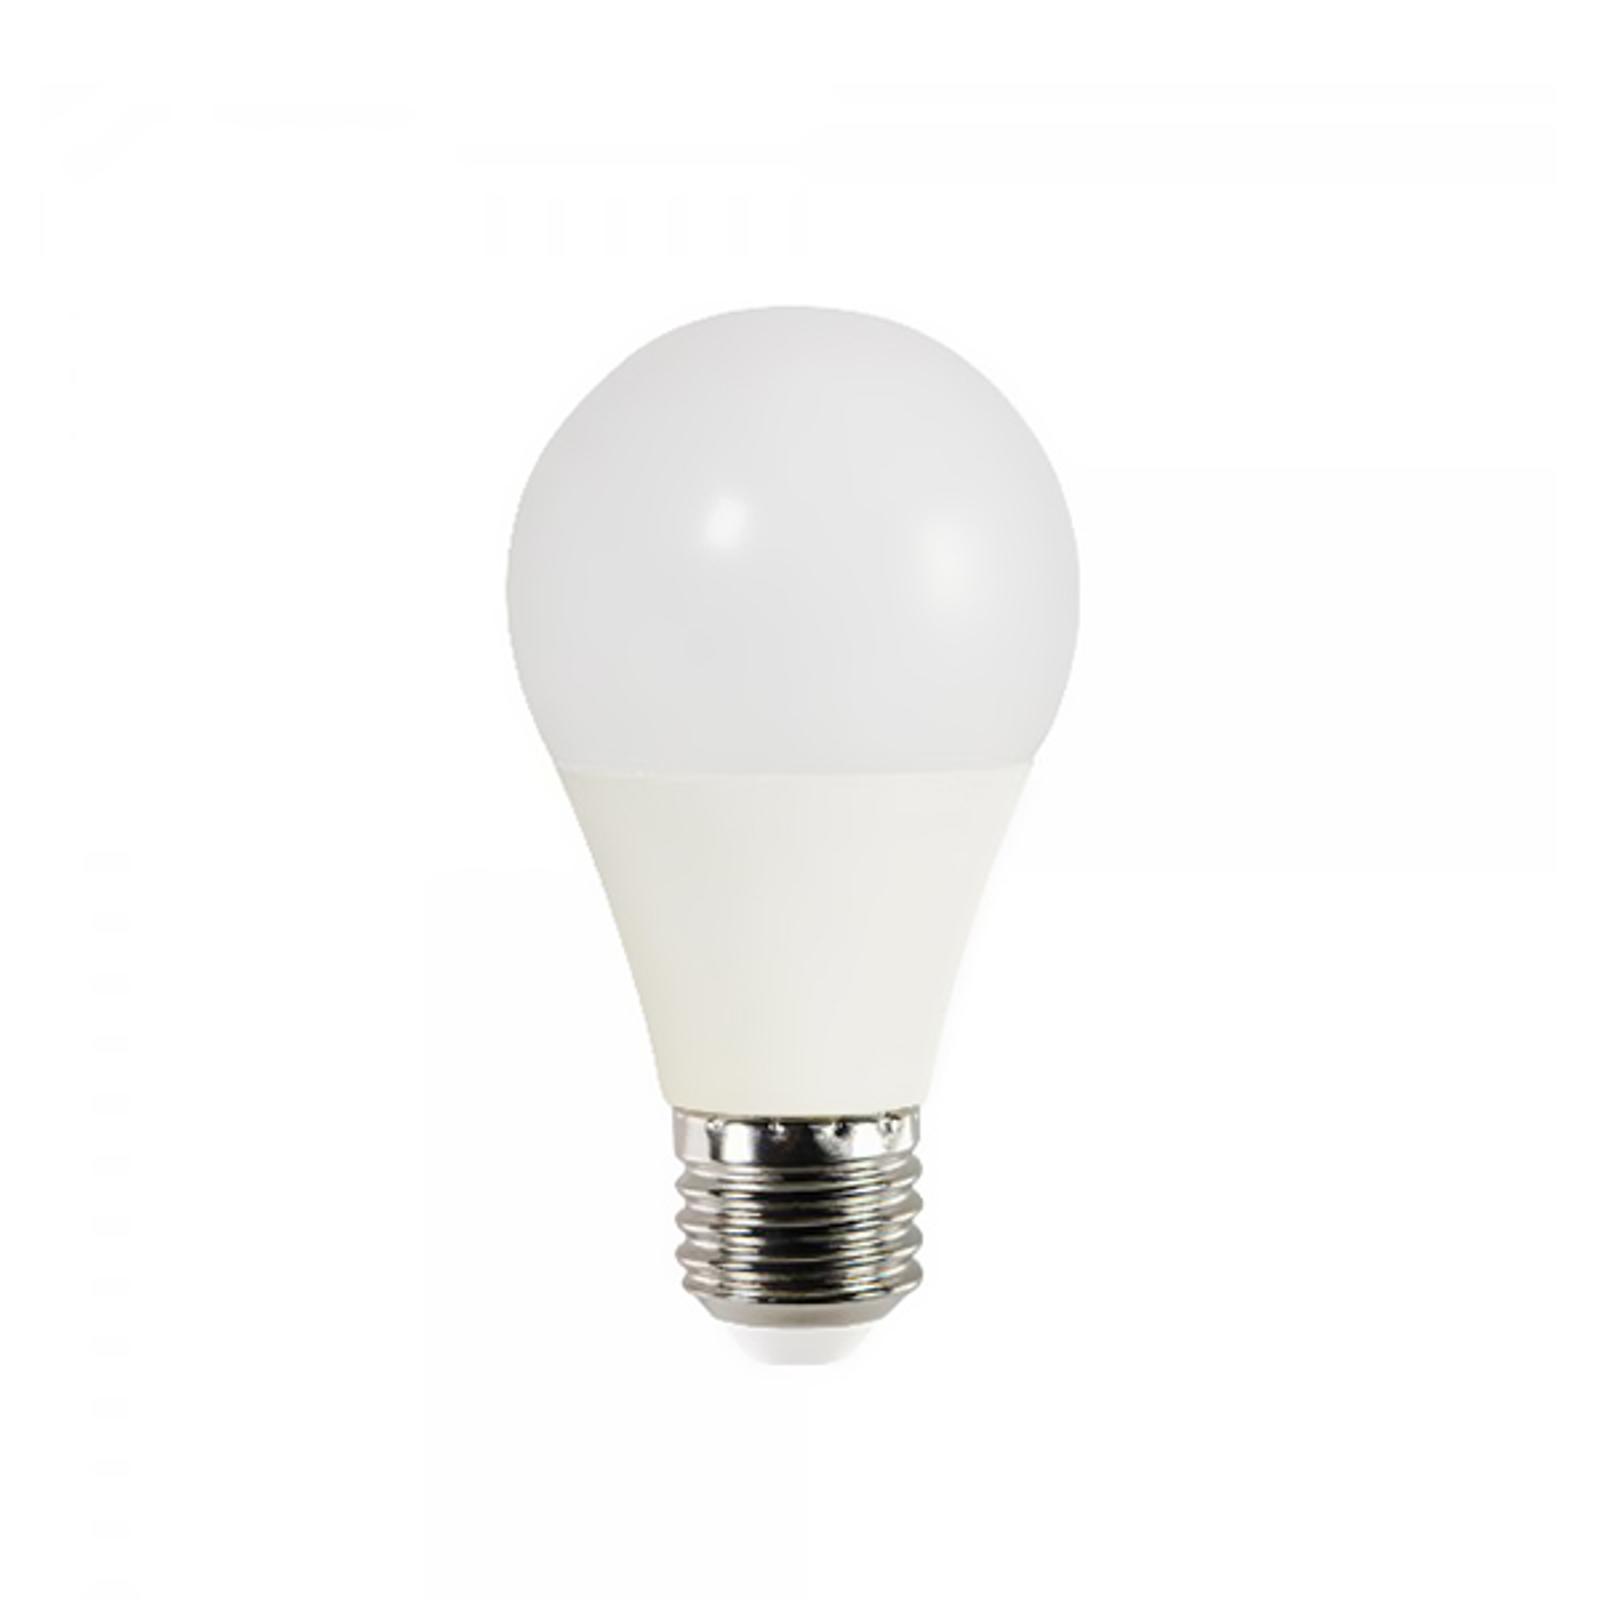 Bombilla convencional LED Araxa E27 8W 828